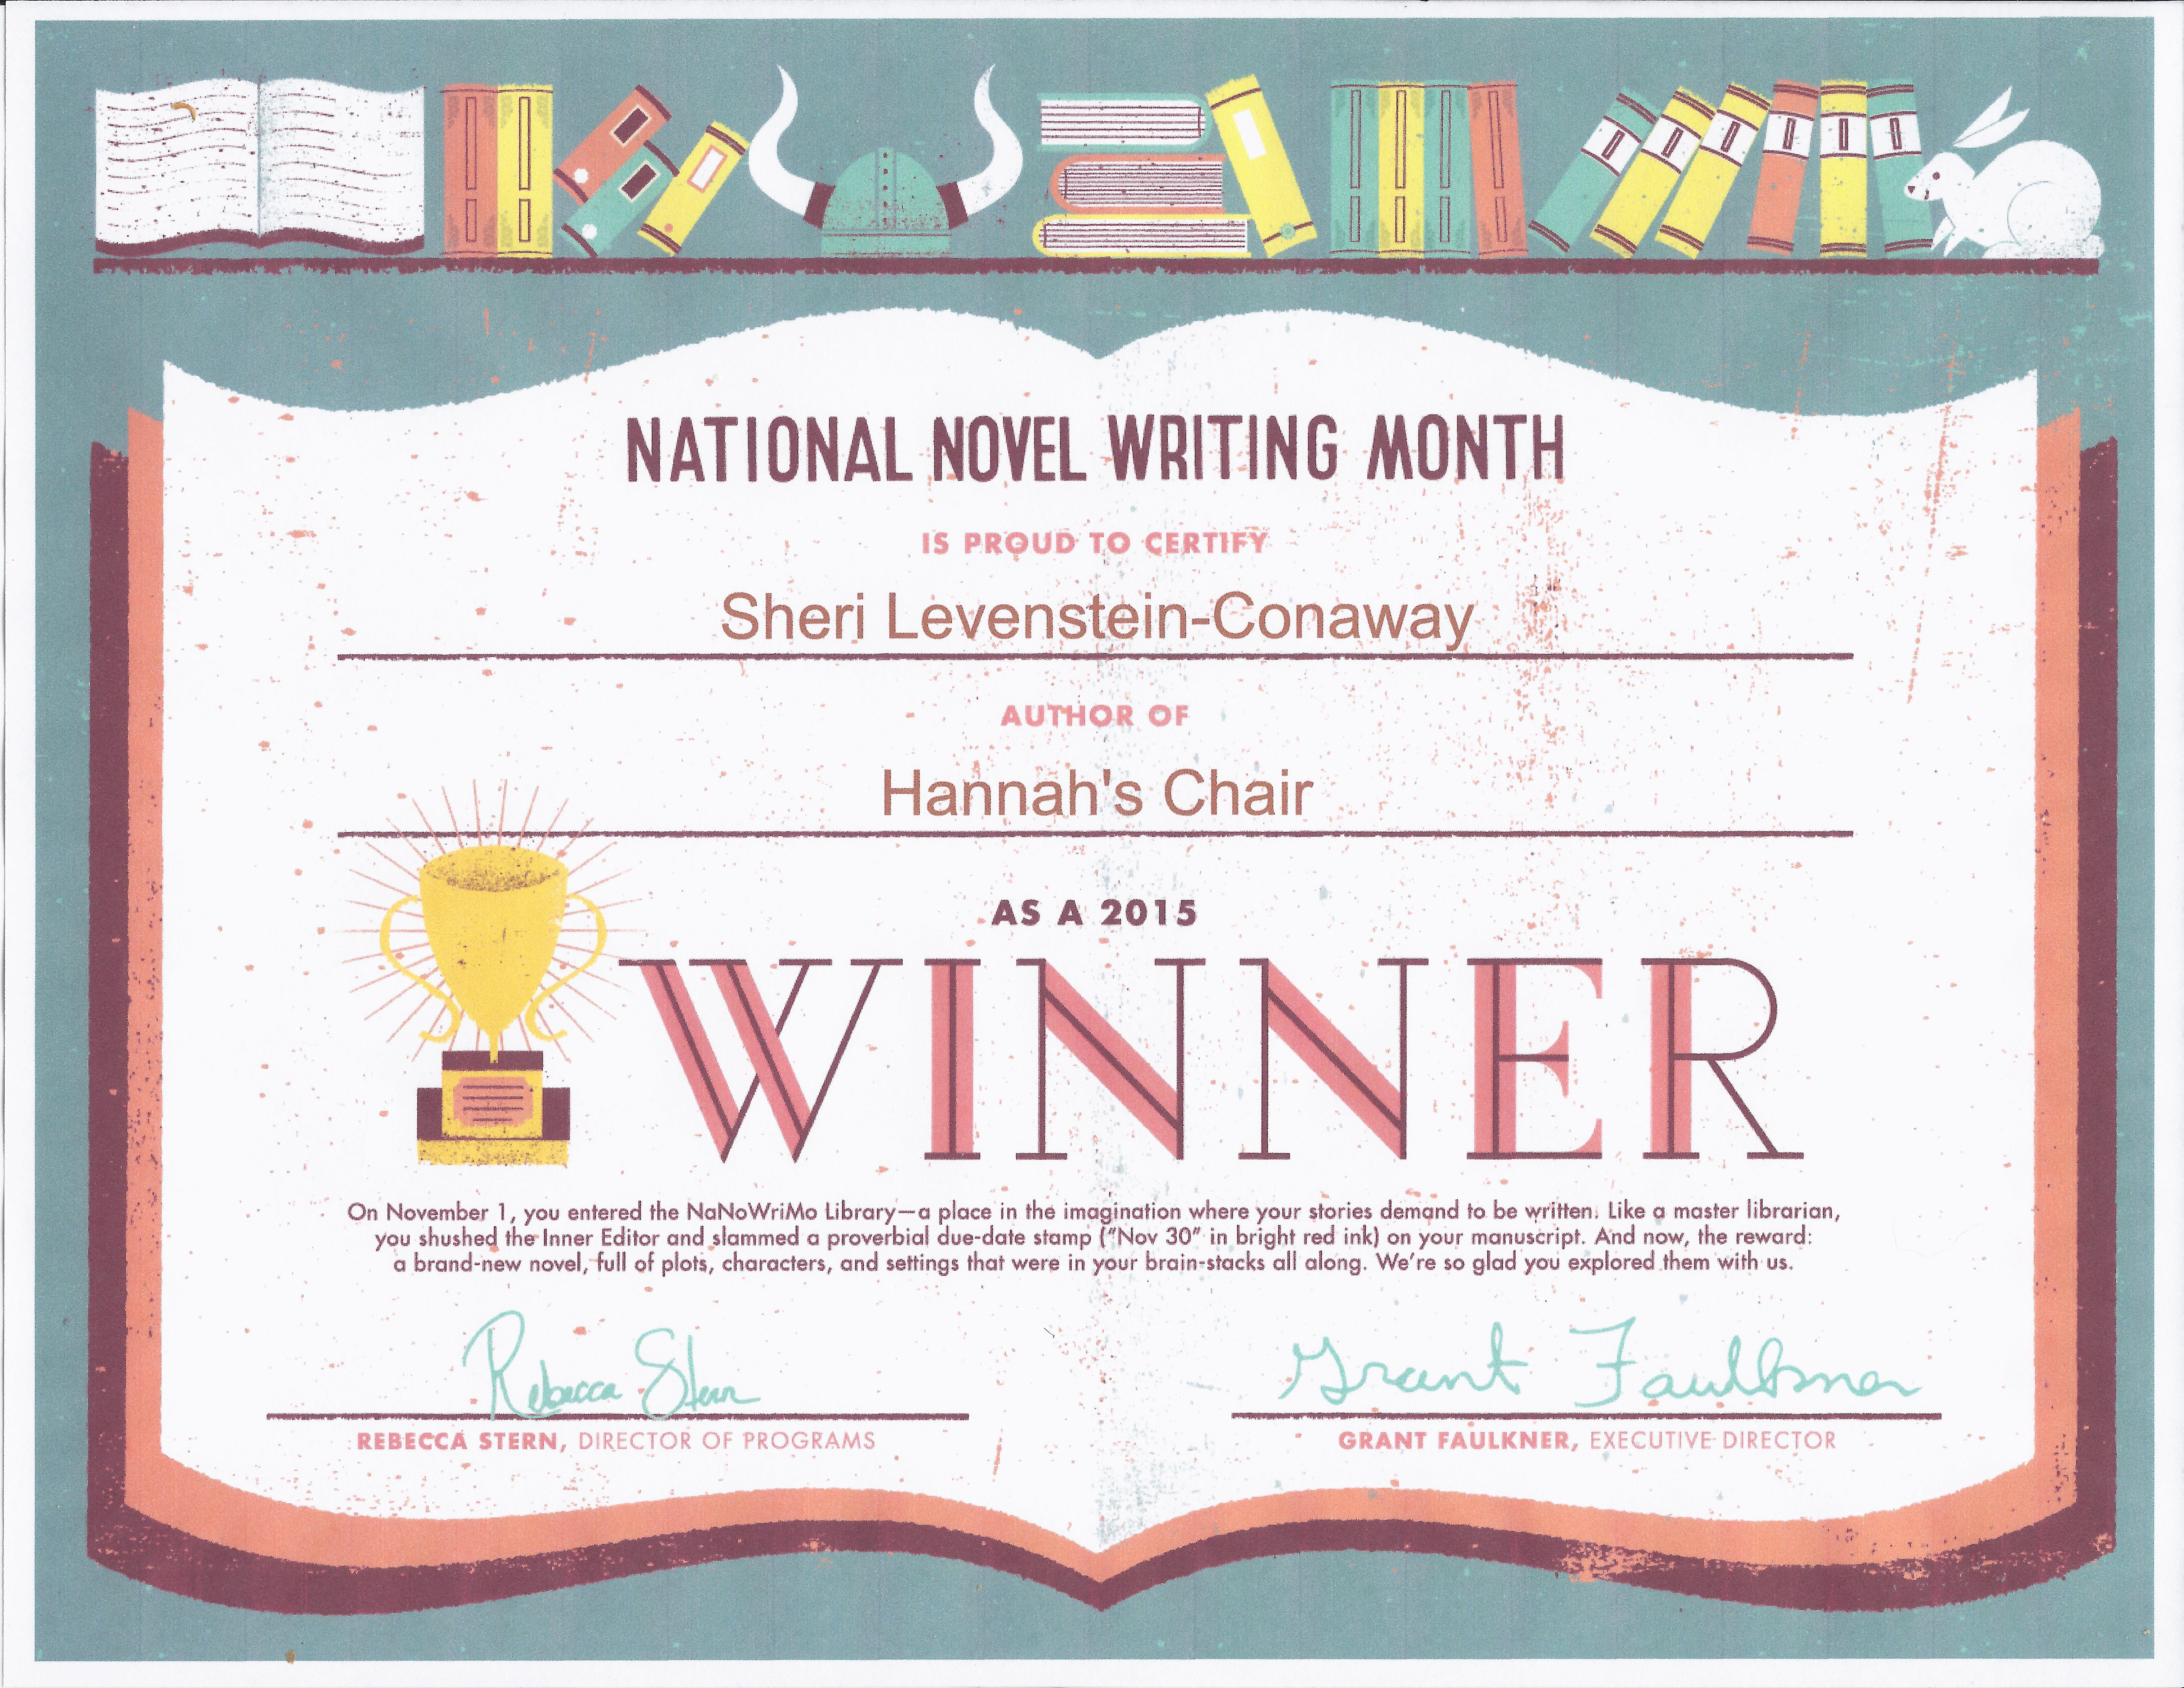 2015 Nano Winners Certificate